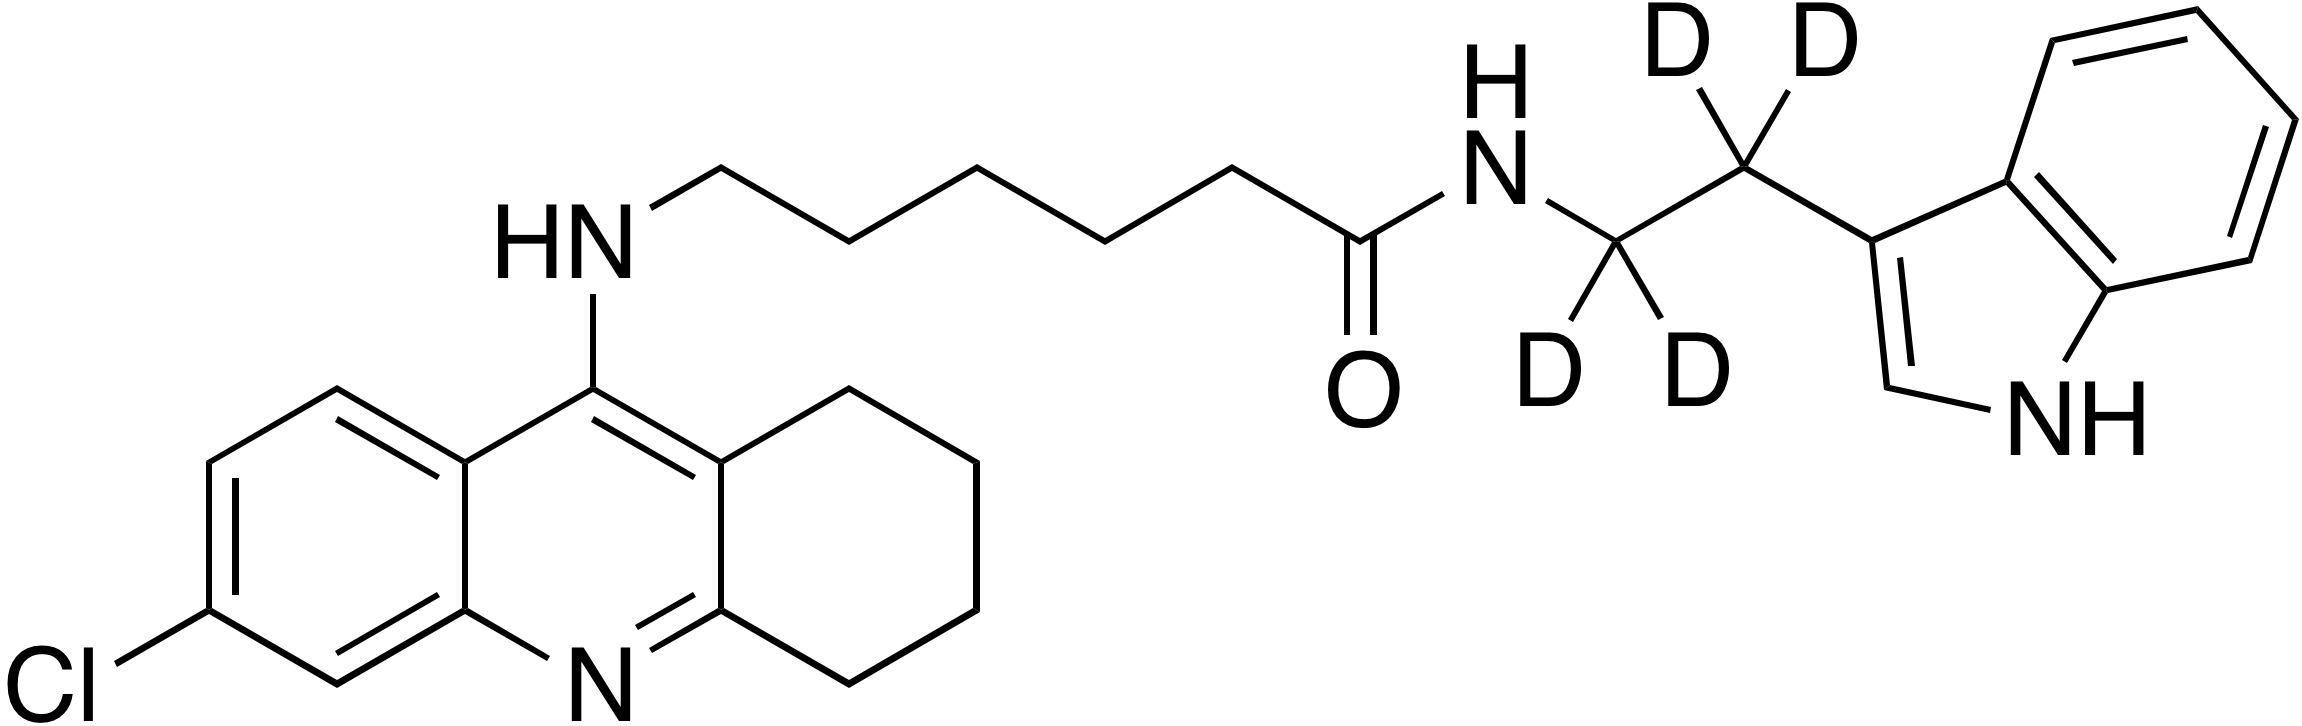 6-(6-Chloro-1,2,3,4-tetrahydroacridin-9-ylamino)hexanoic acid [2-(1H-indol-3-yl)ethyl-d<sub>4</sub>]amide